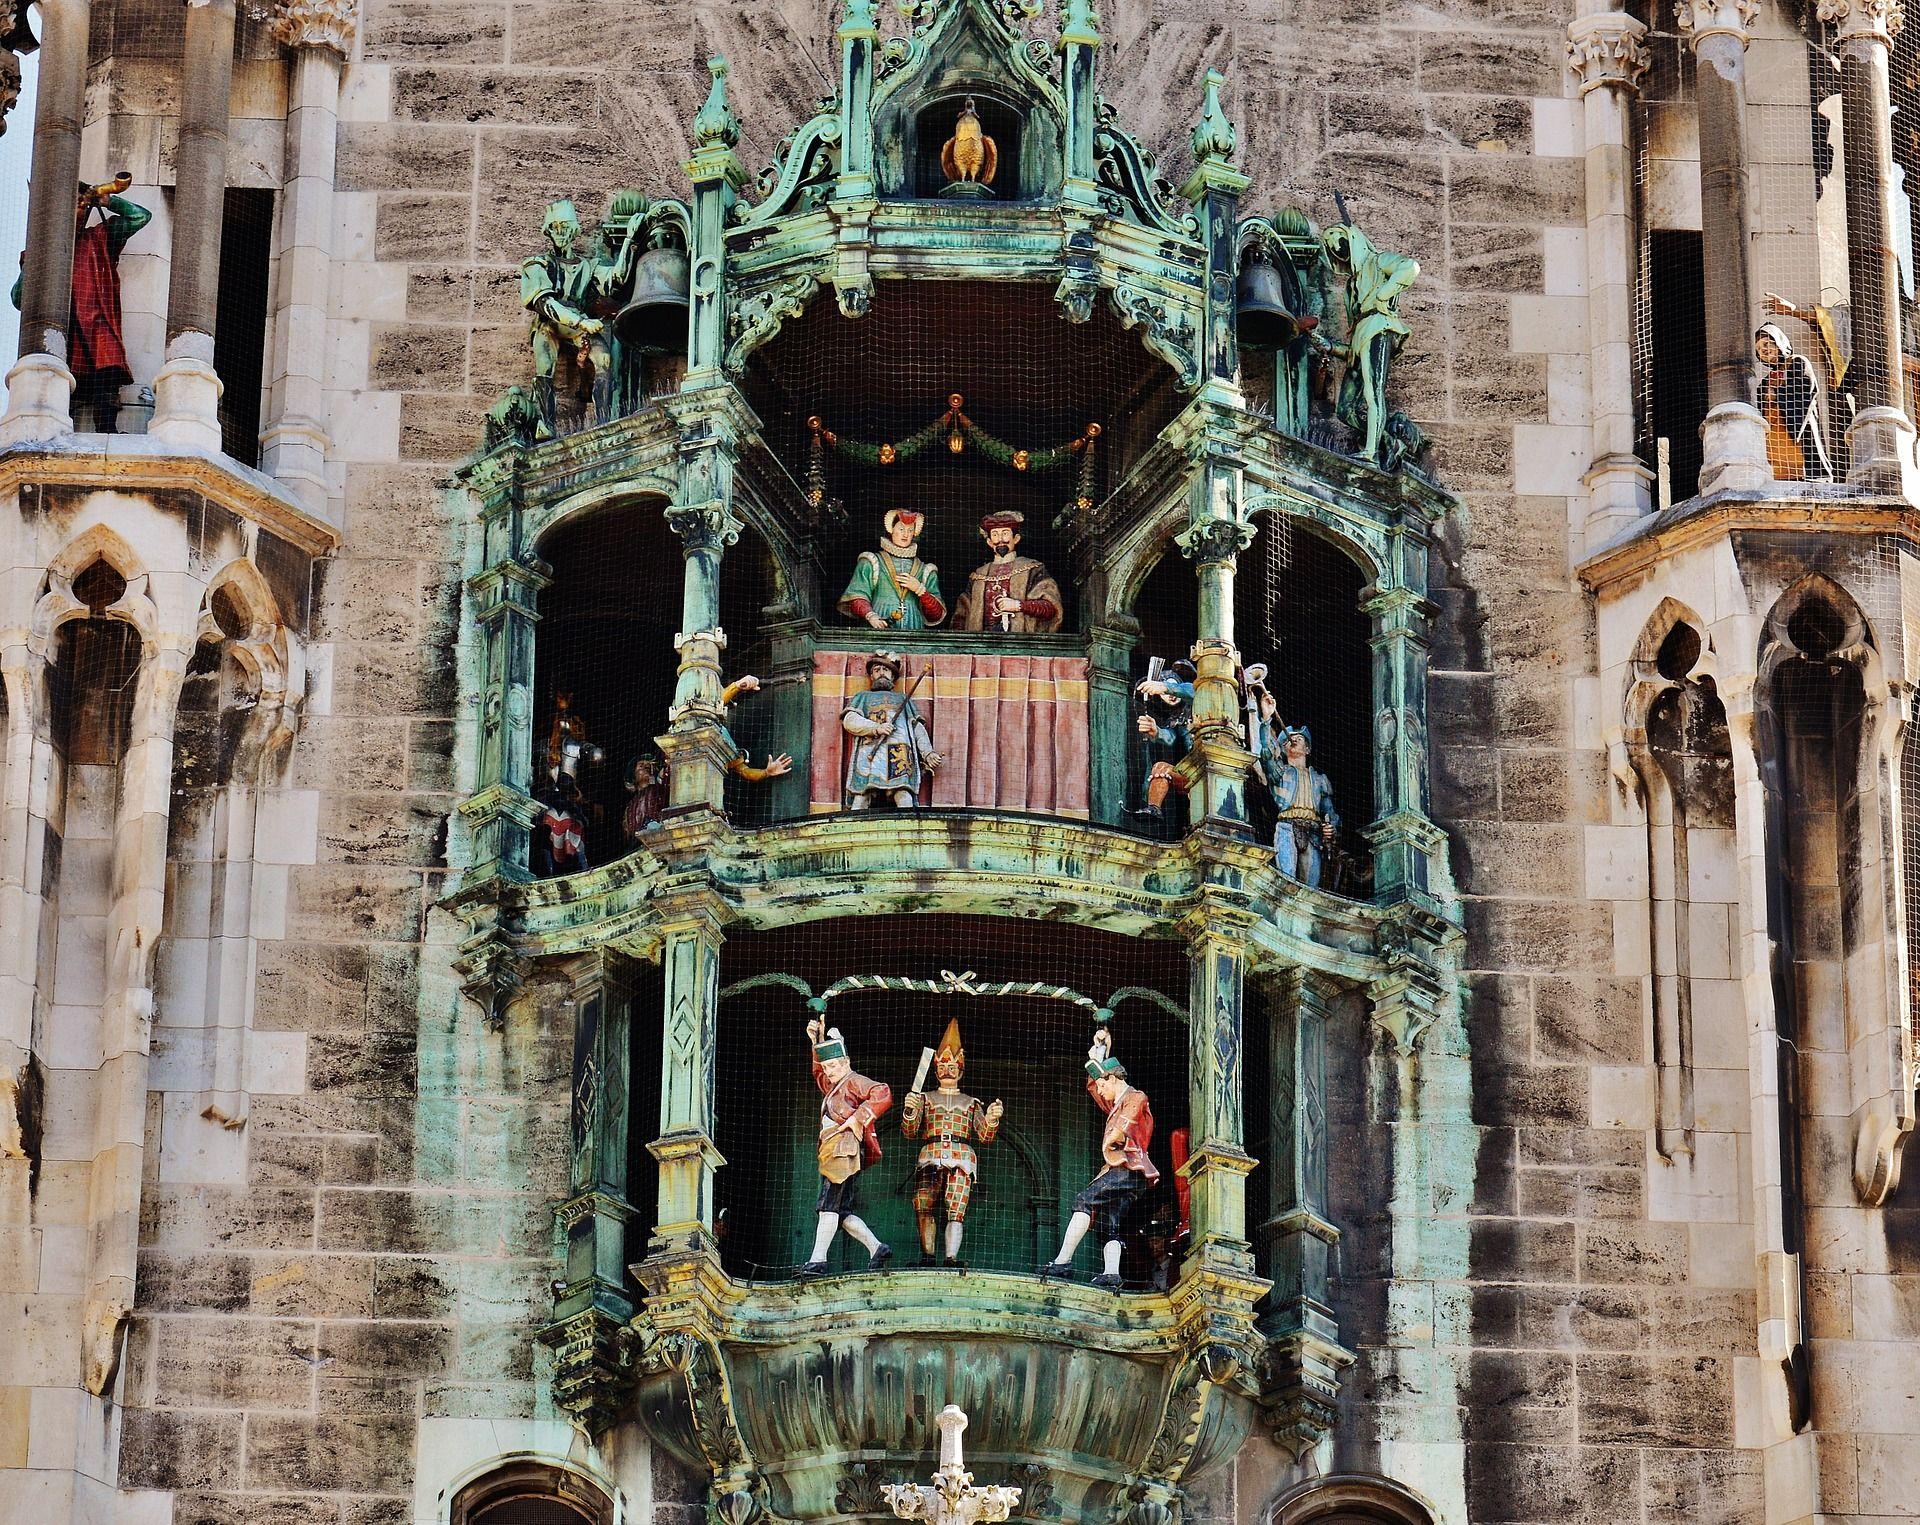 Das Glockenspiel am Marienplatz © Alexas_Fotos / pixabay